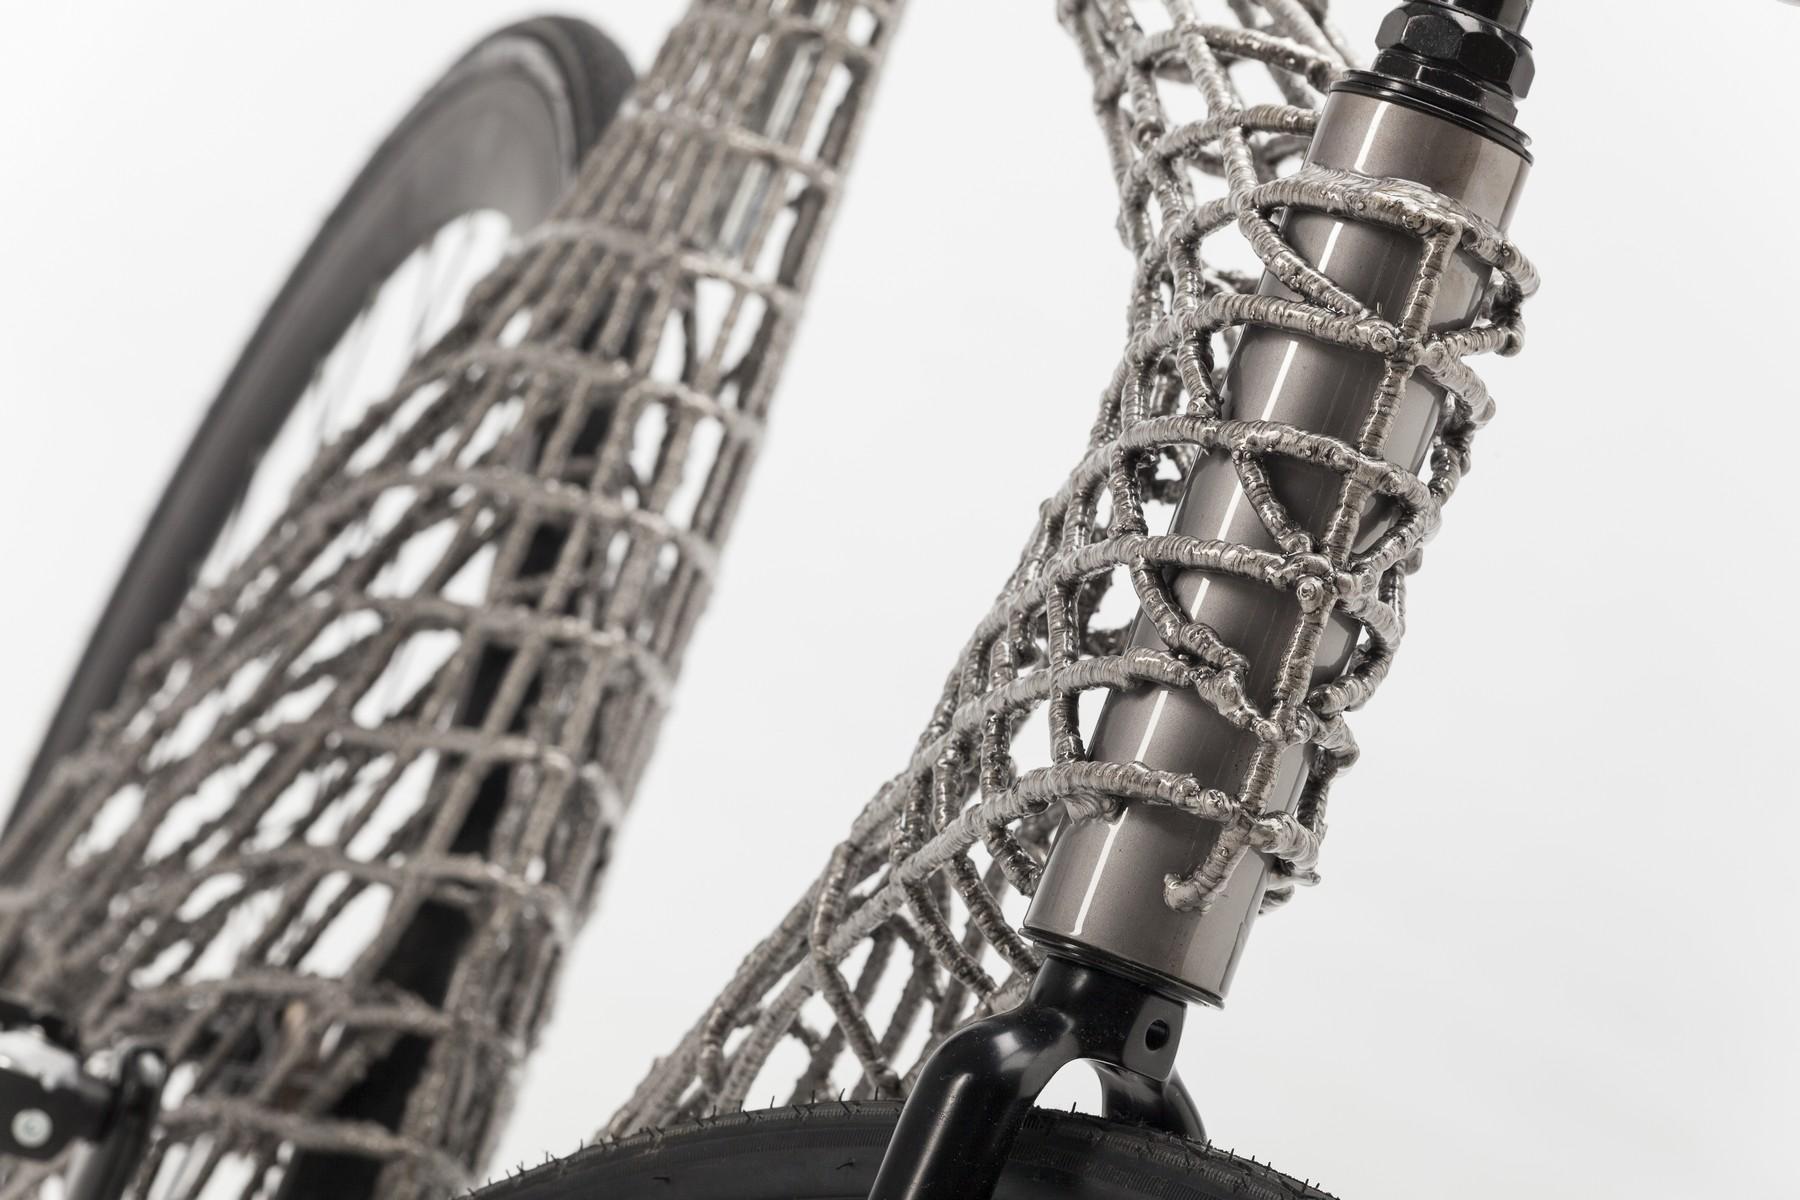 3d Друк велосипеда металом (2)